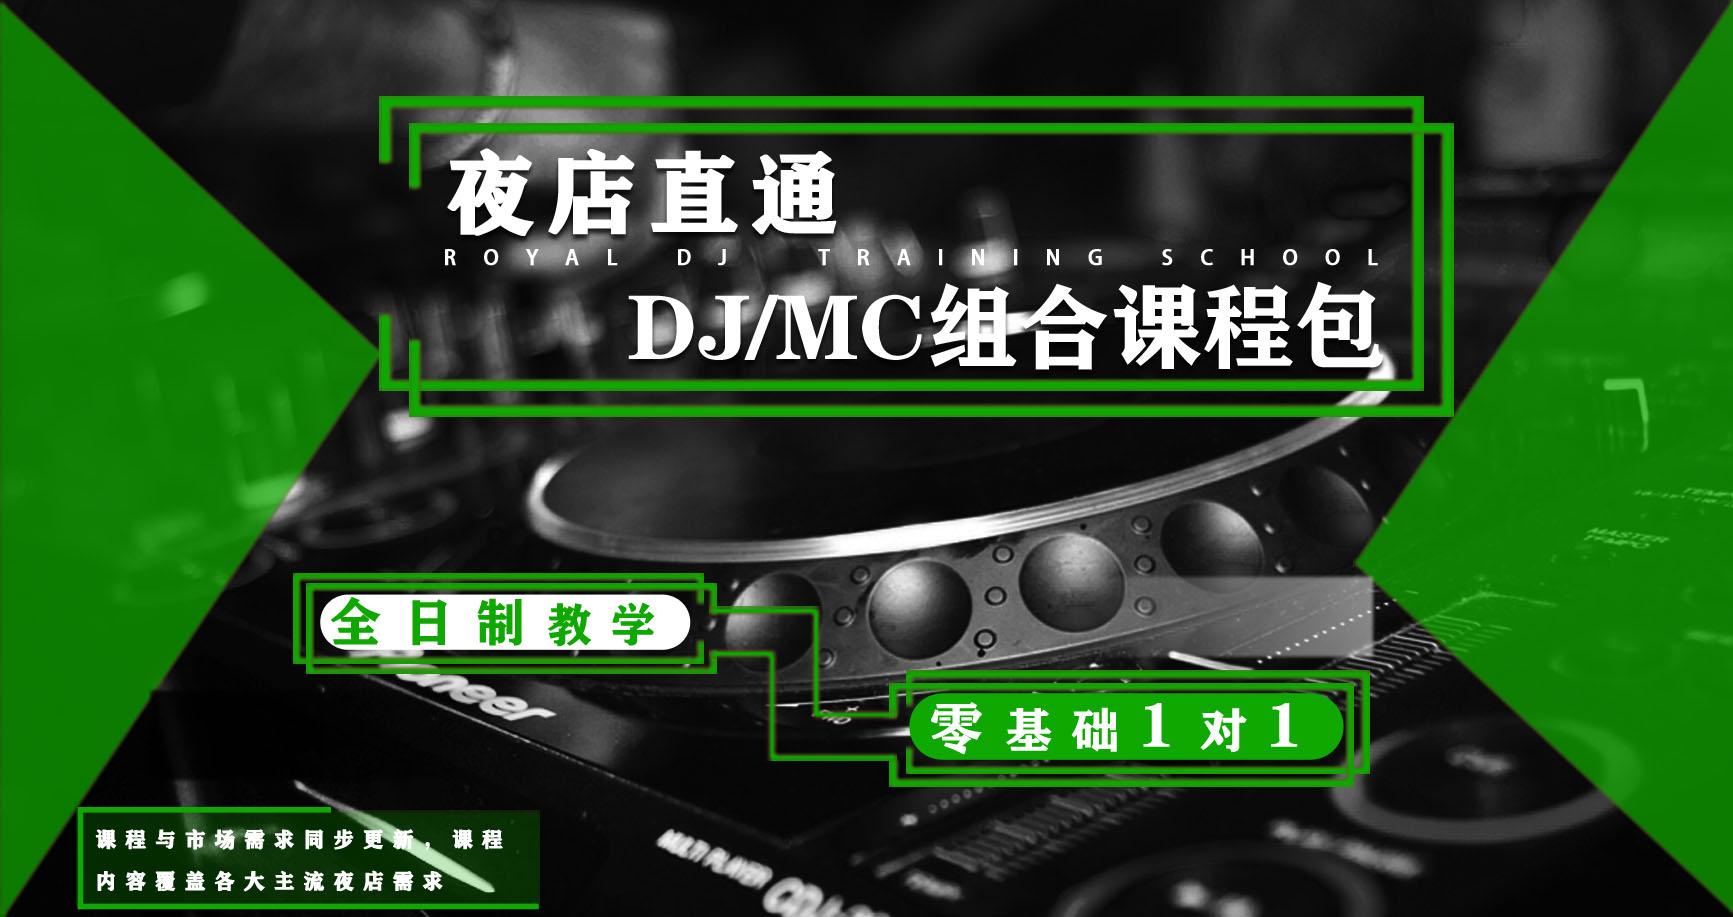 royal DJ 厂牌Scratch DJ技巧终极认证课程包